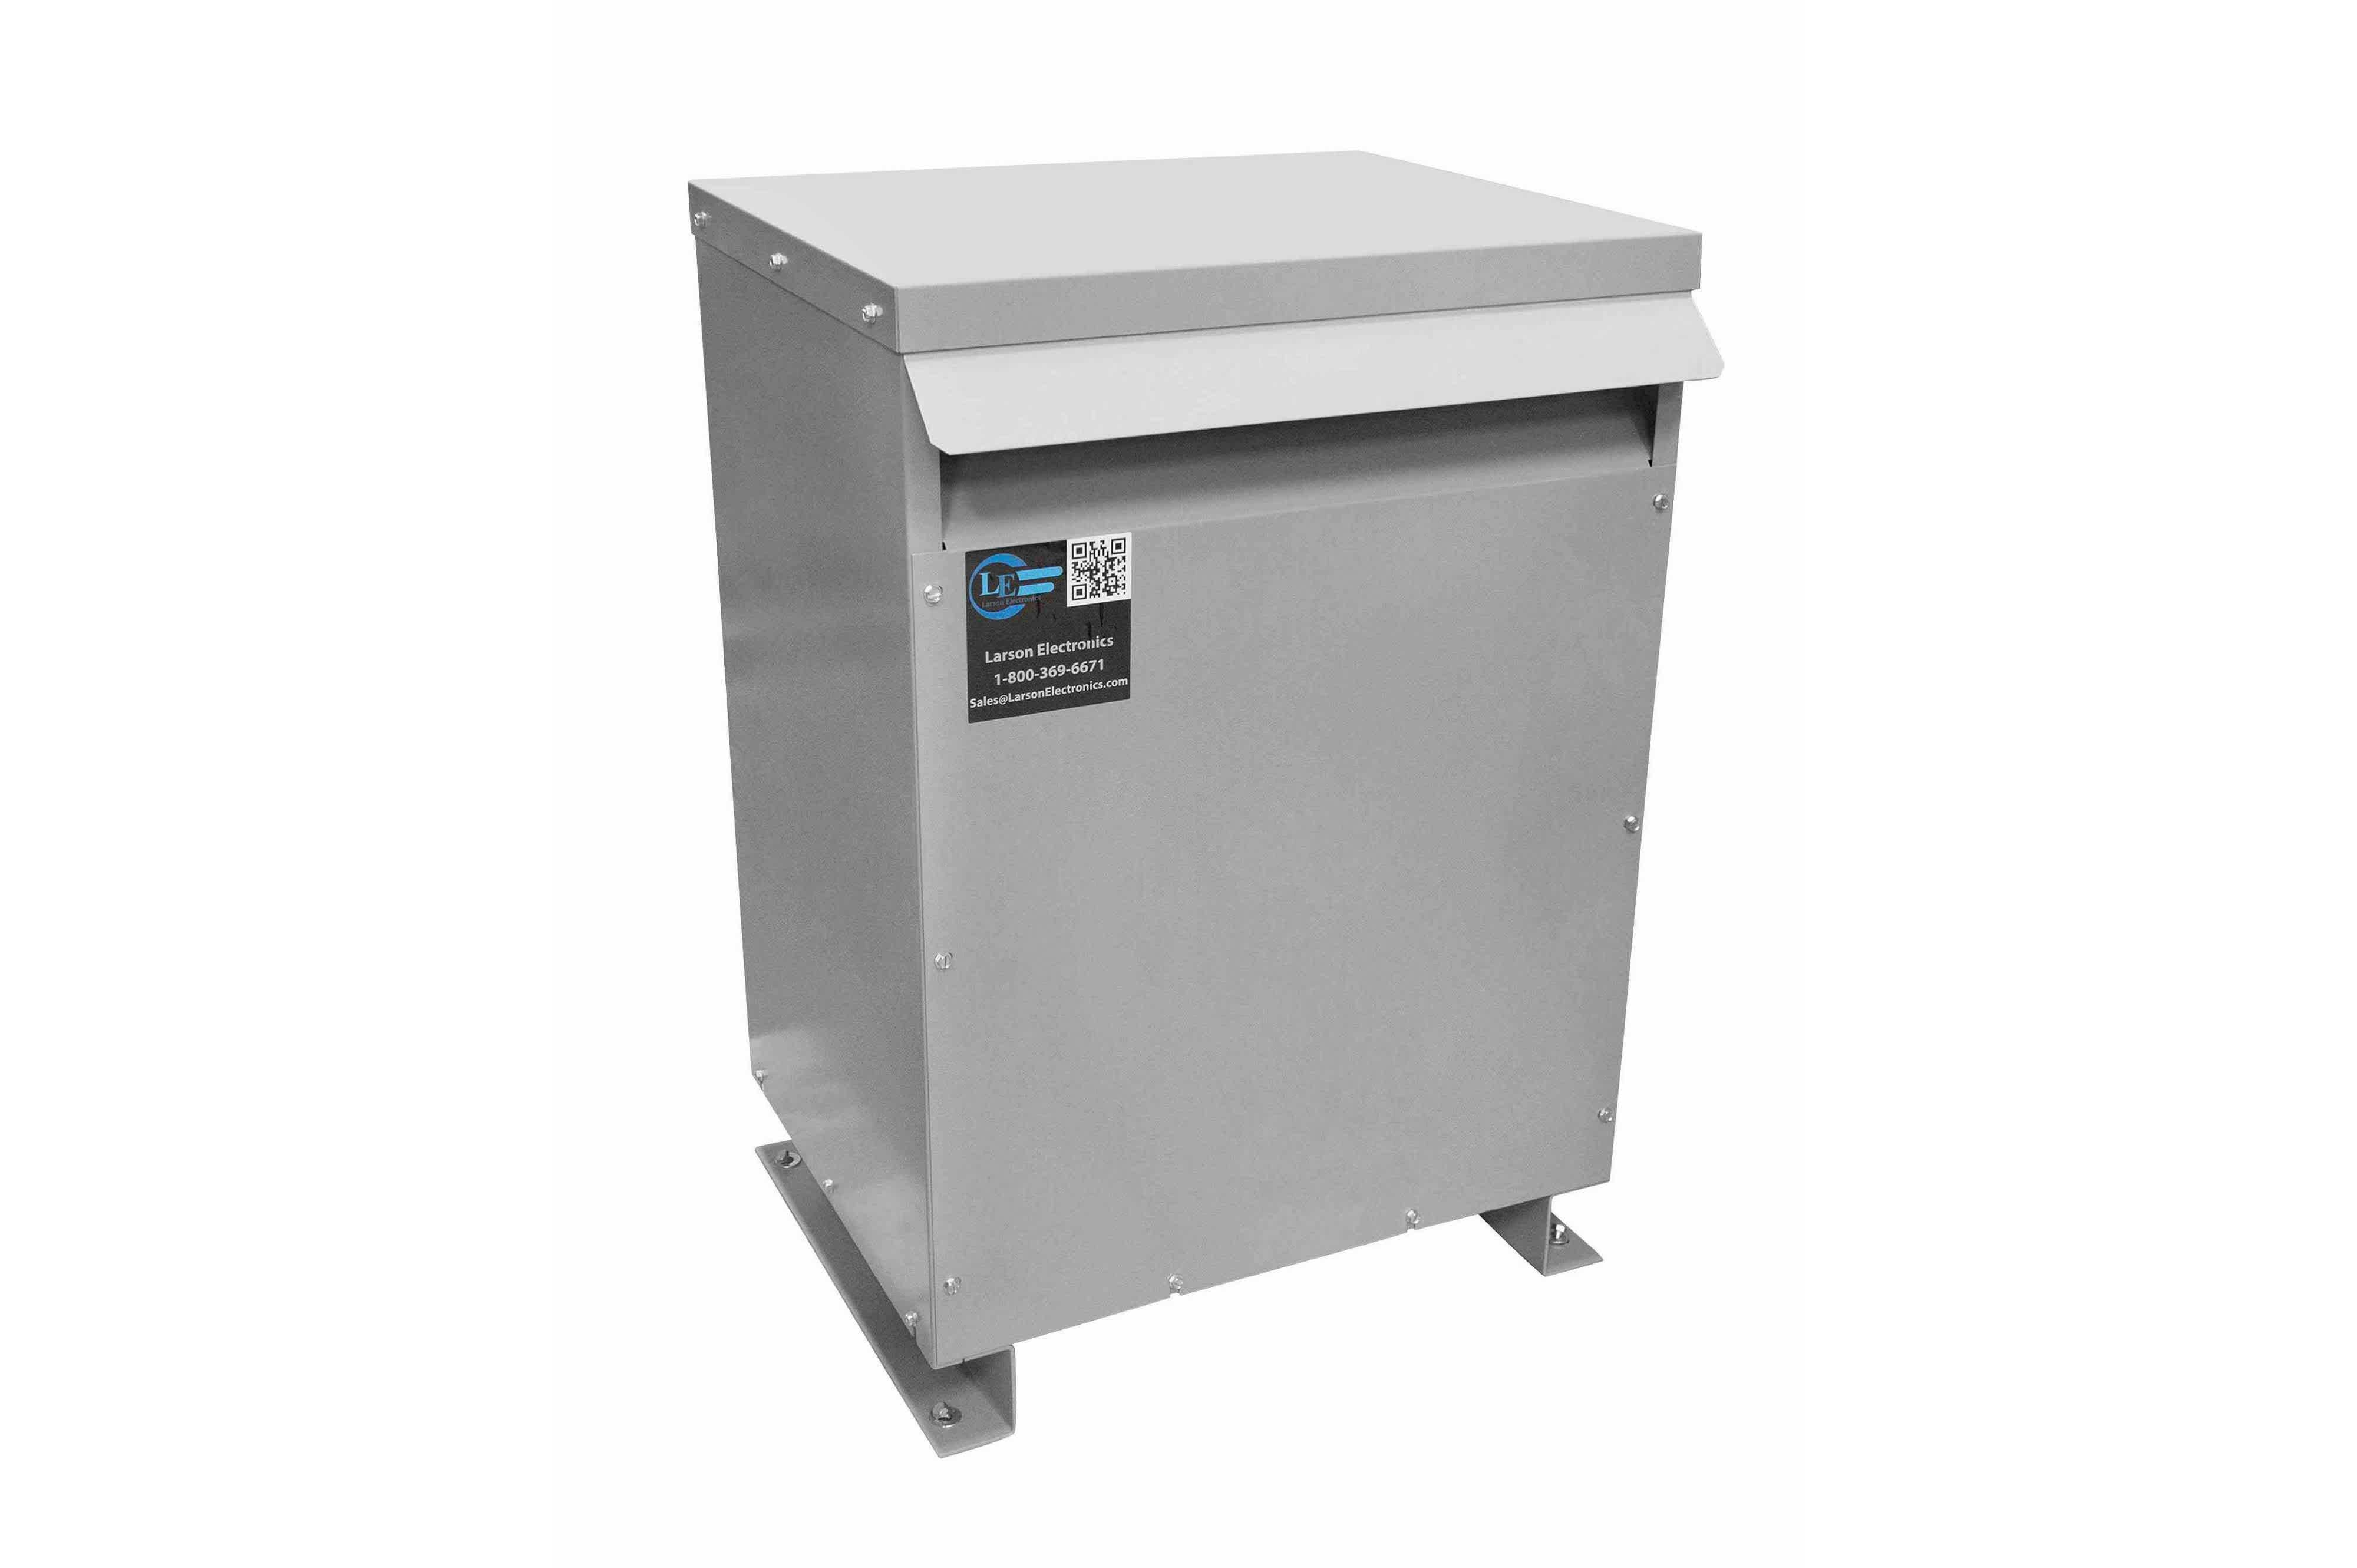 300 kVA 3PH DOE Transformer, 380V Delta Primary, 480Y/277 Wye-N Secondary, N3R, Ventilated, 60 Hz